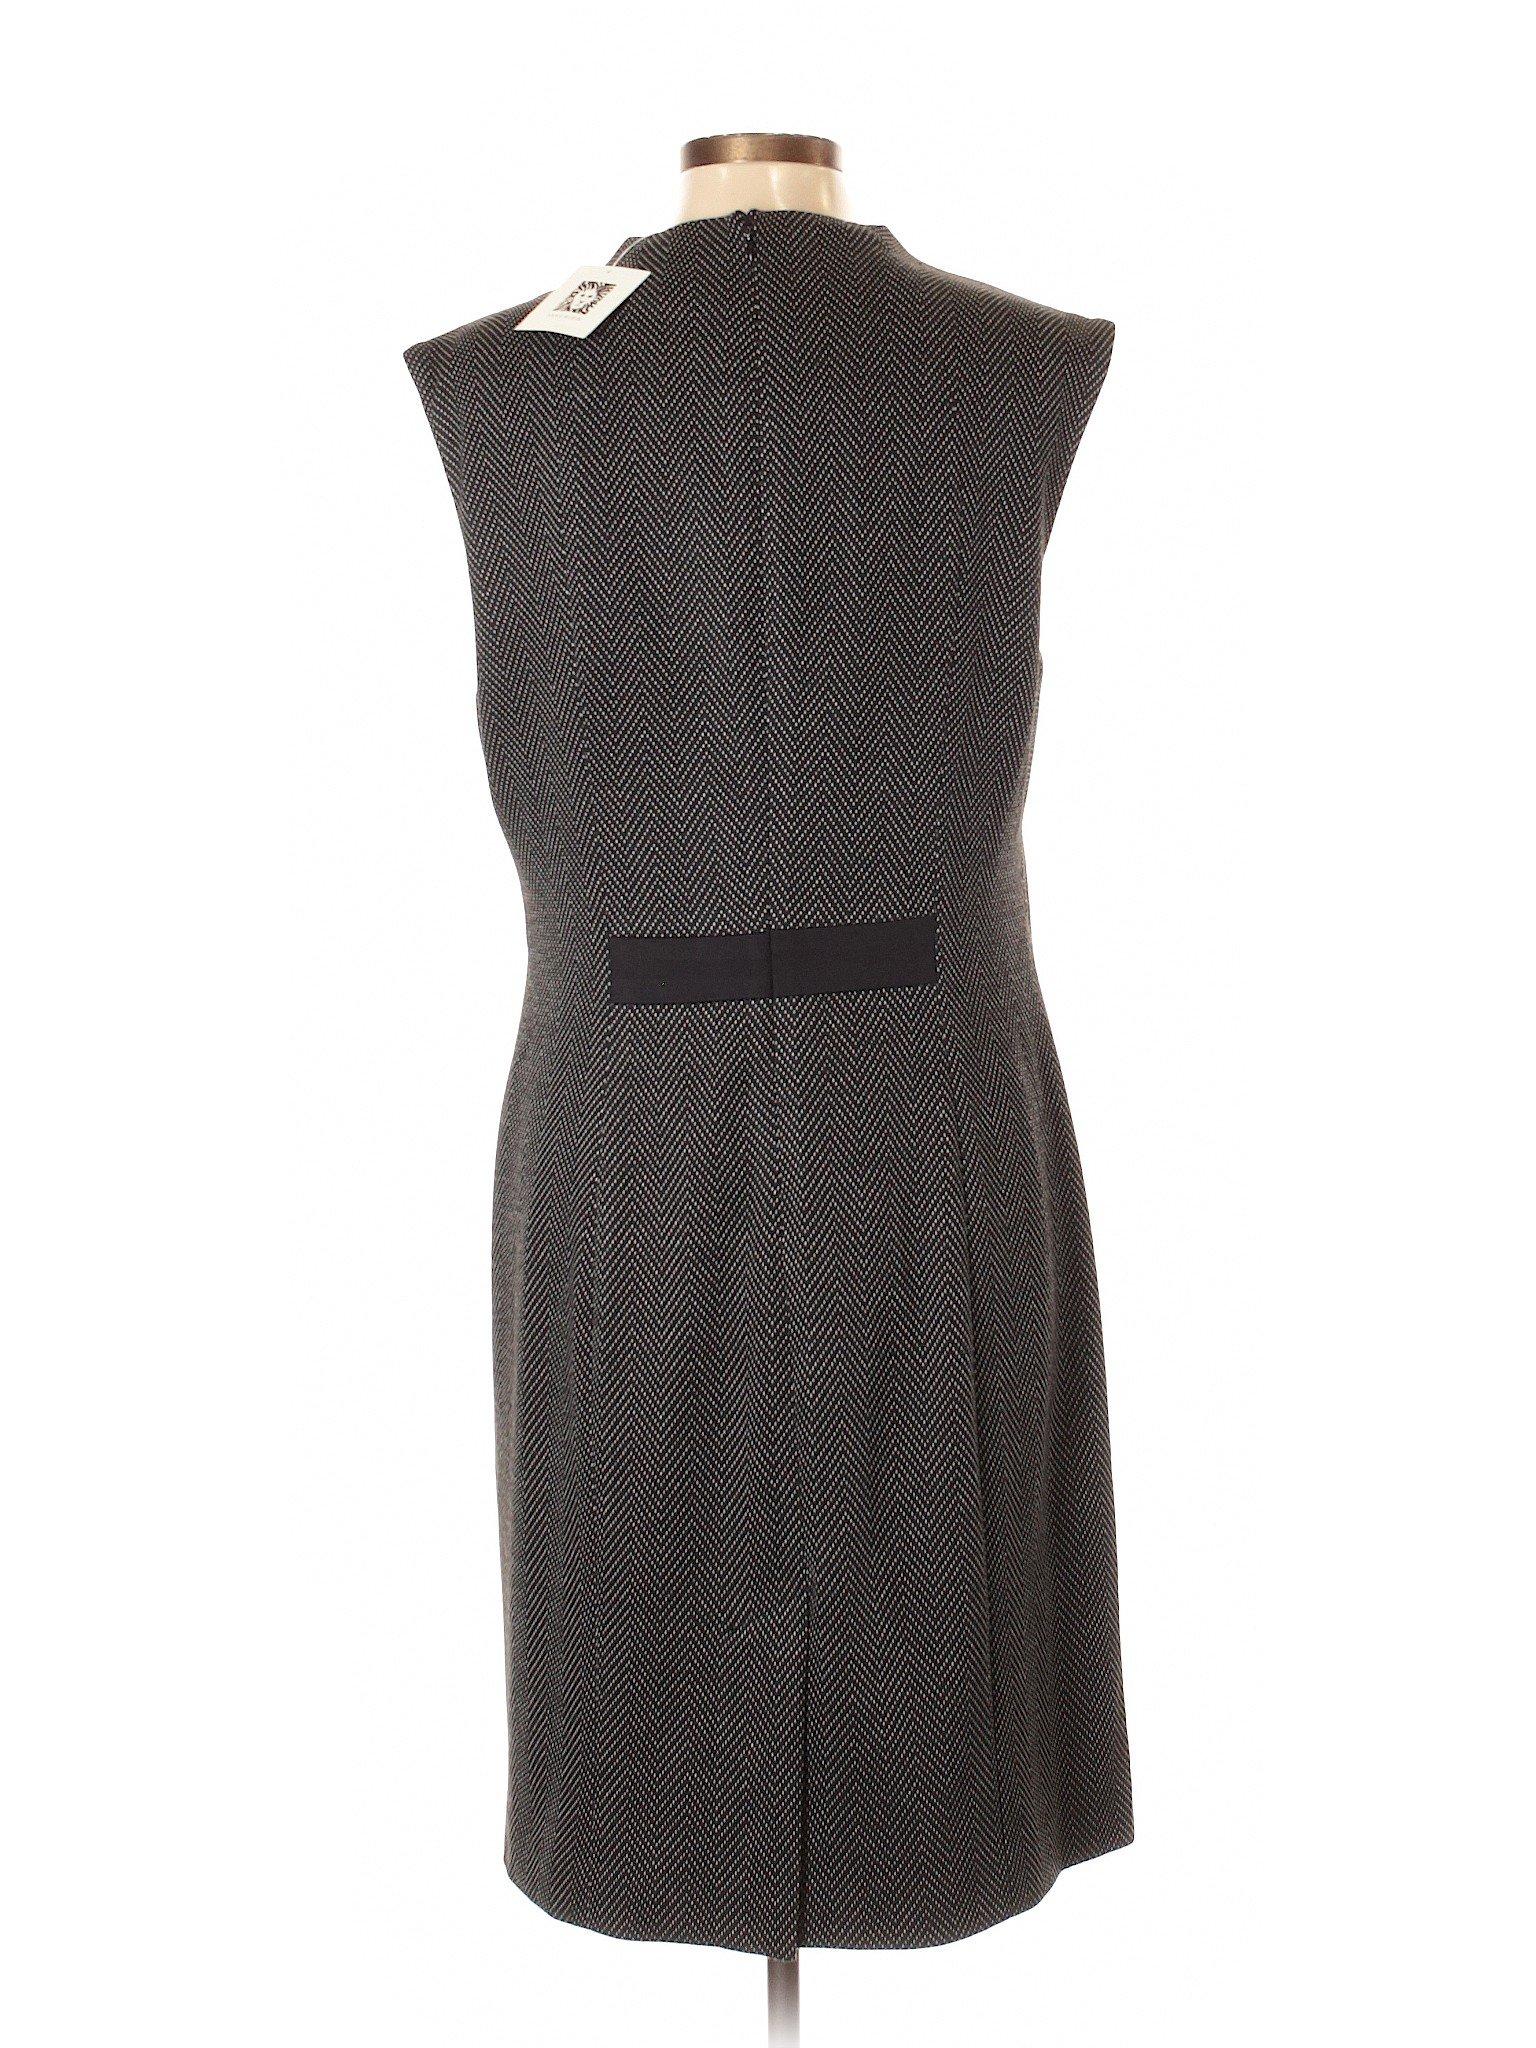 Klein Boutique Dress Anne winter Casual 44ZBHa8wq